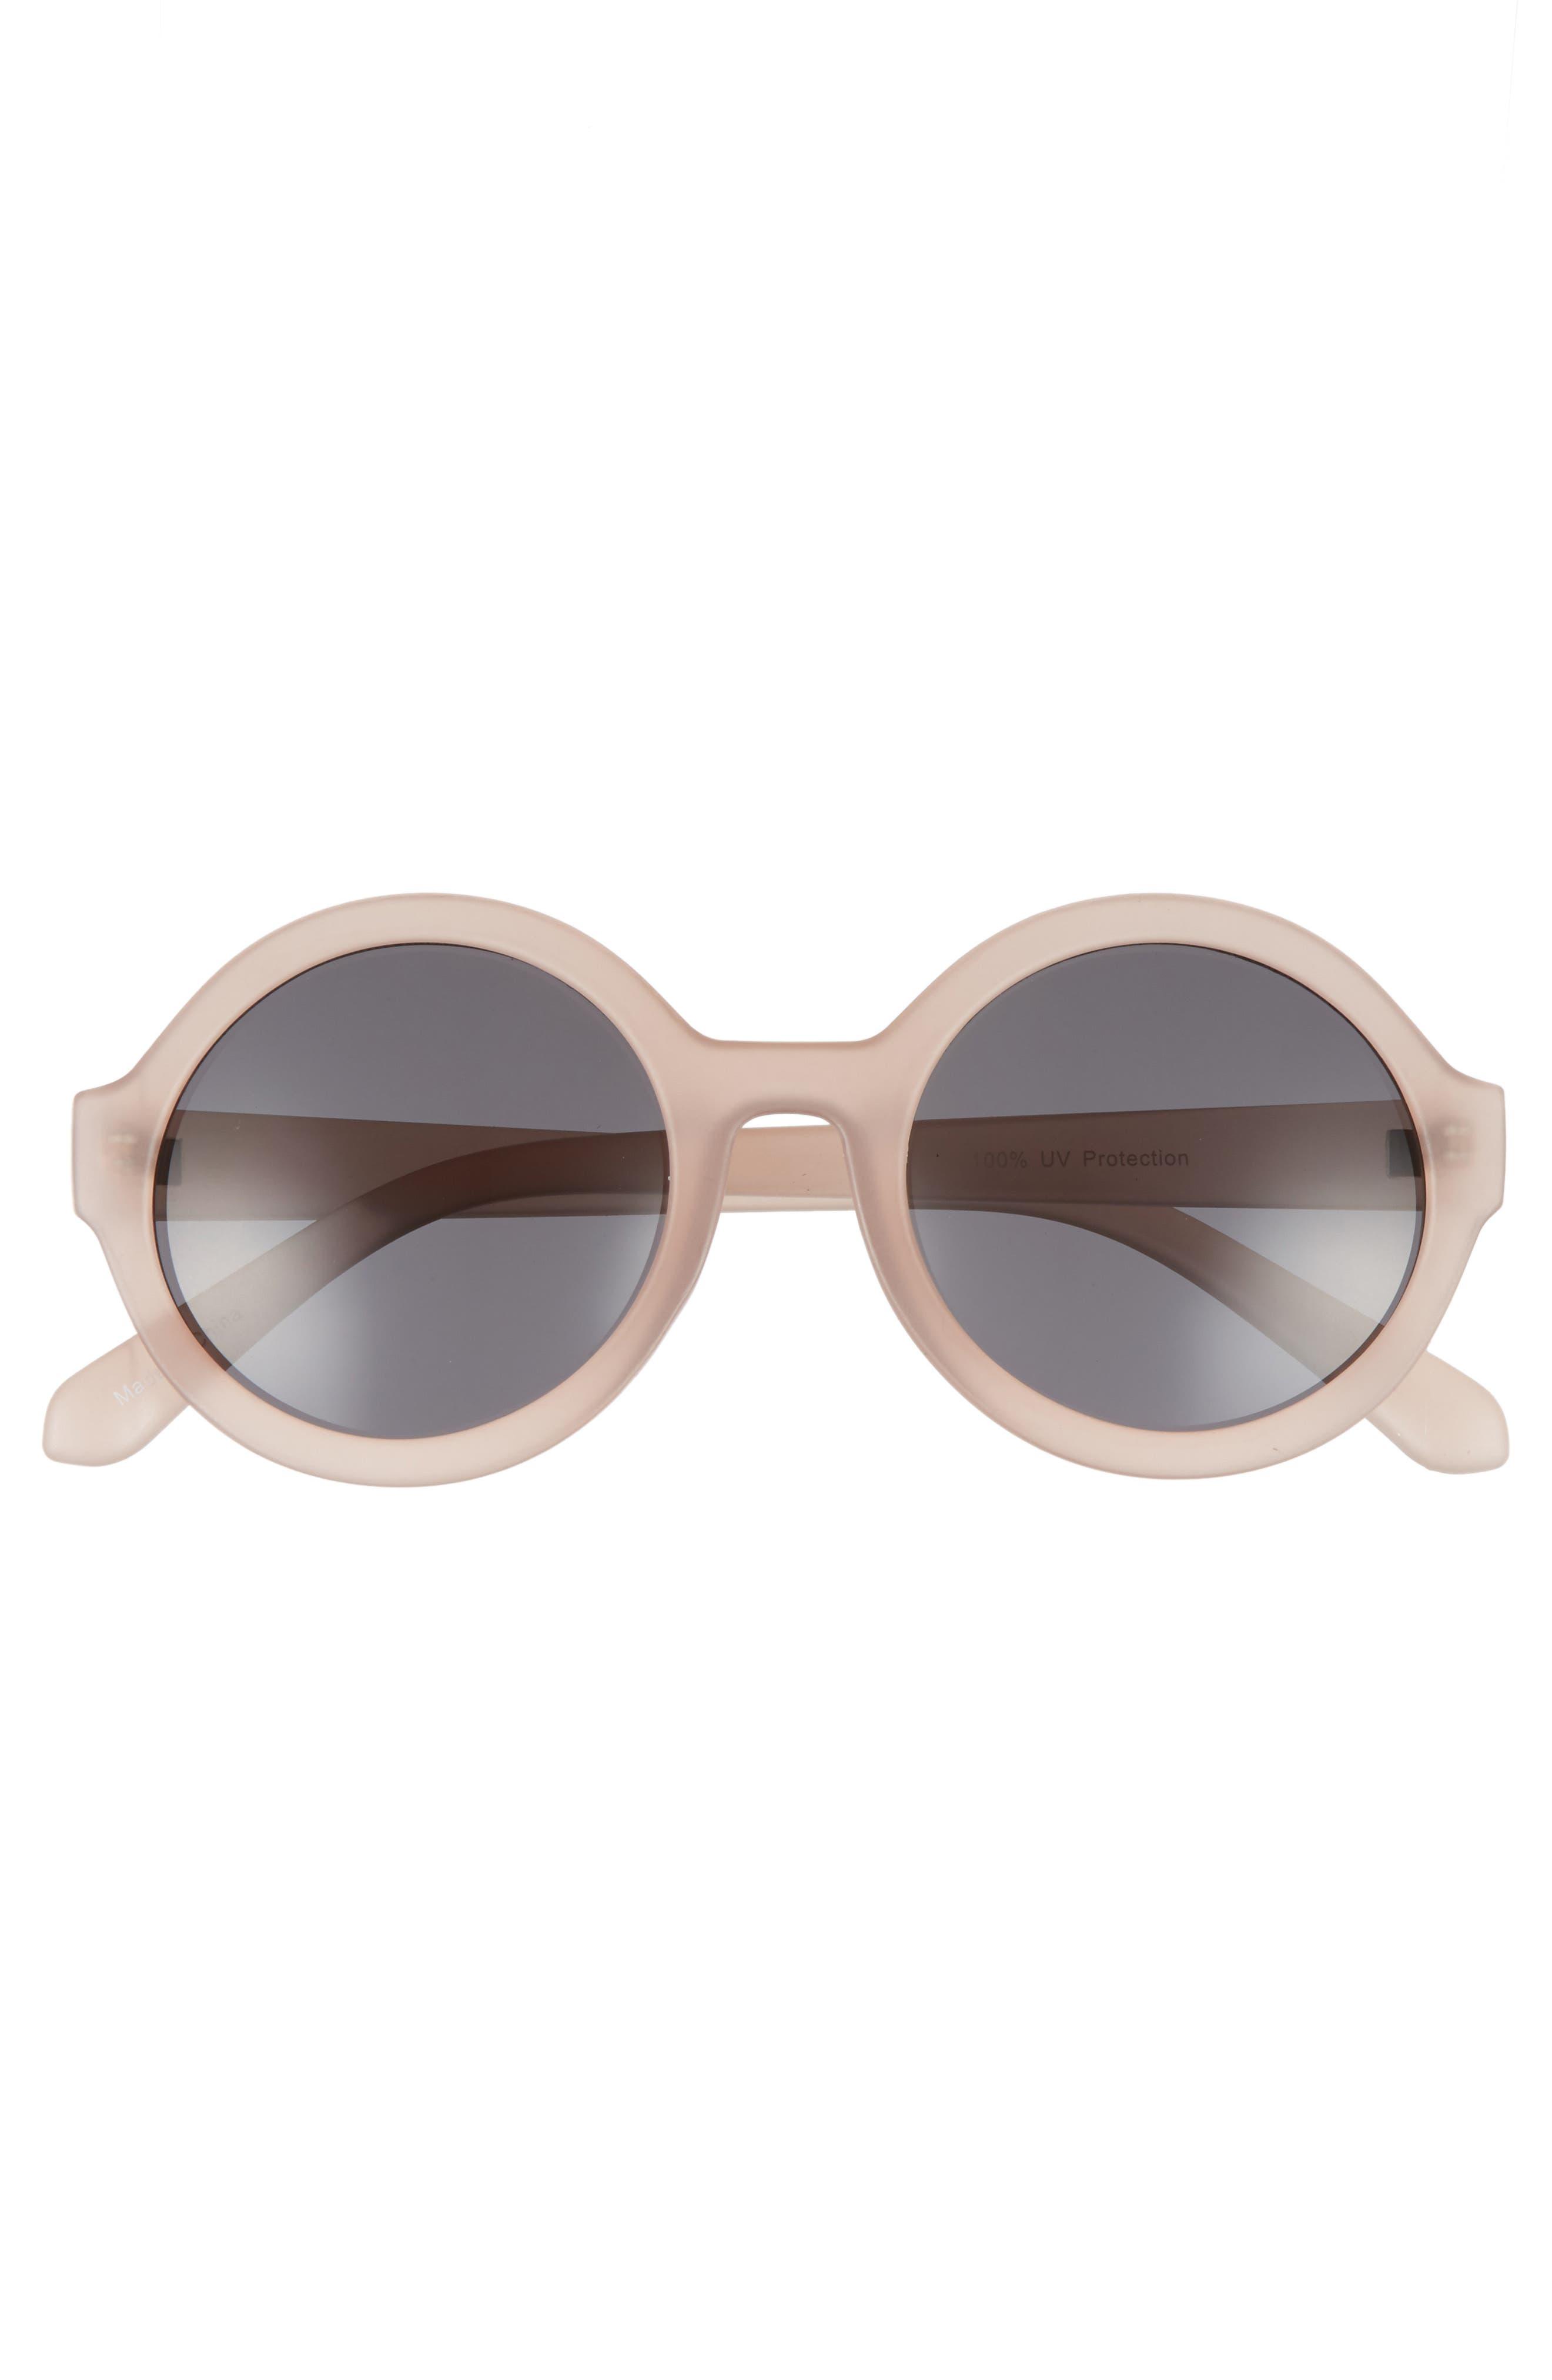 50mm Round Sunglasses,                             Alternate thumbnail 3, color,                             Mauve